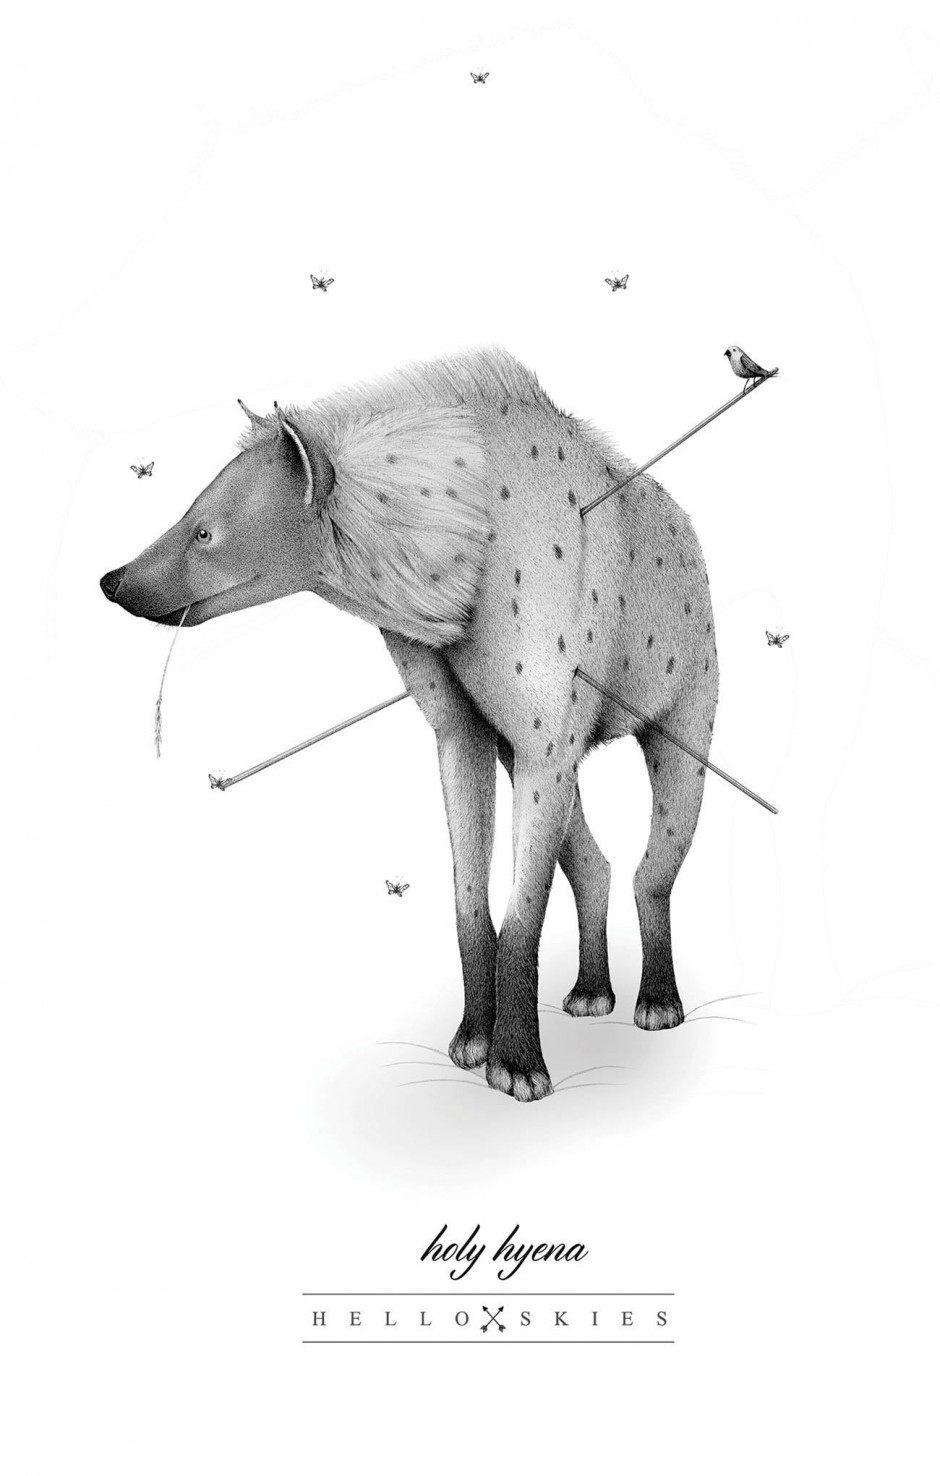 Holy Hyena